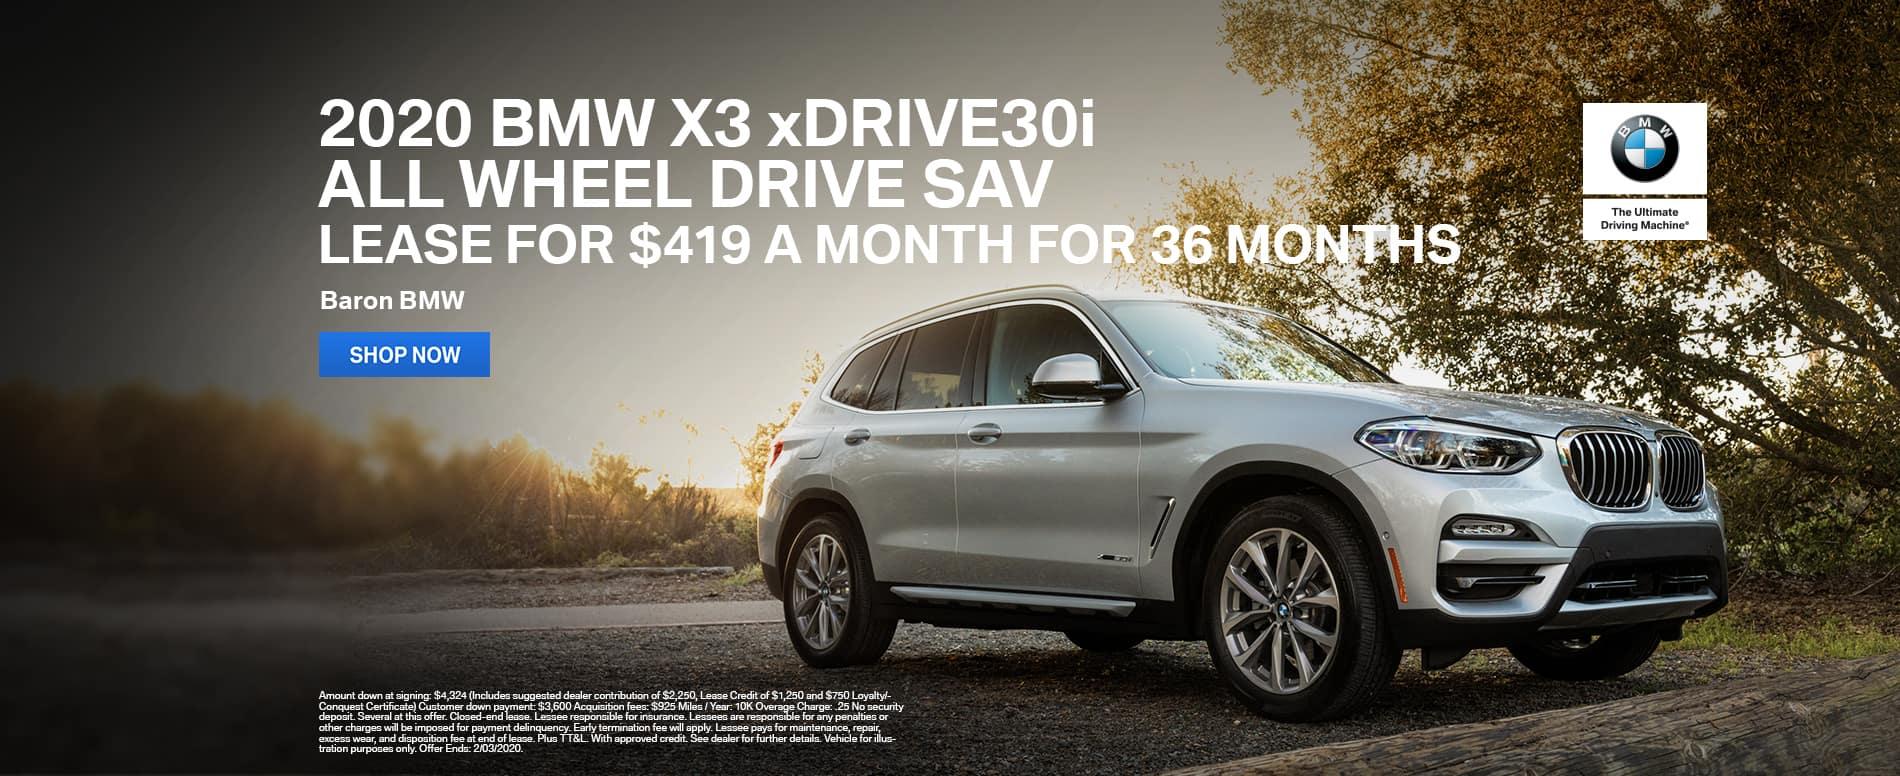 2020 X3 xDrive30i All Wheel Drive lease Kansas City